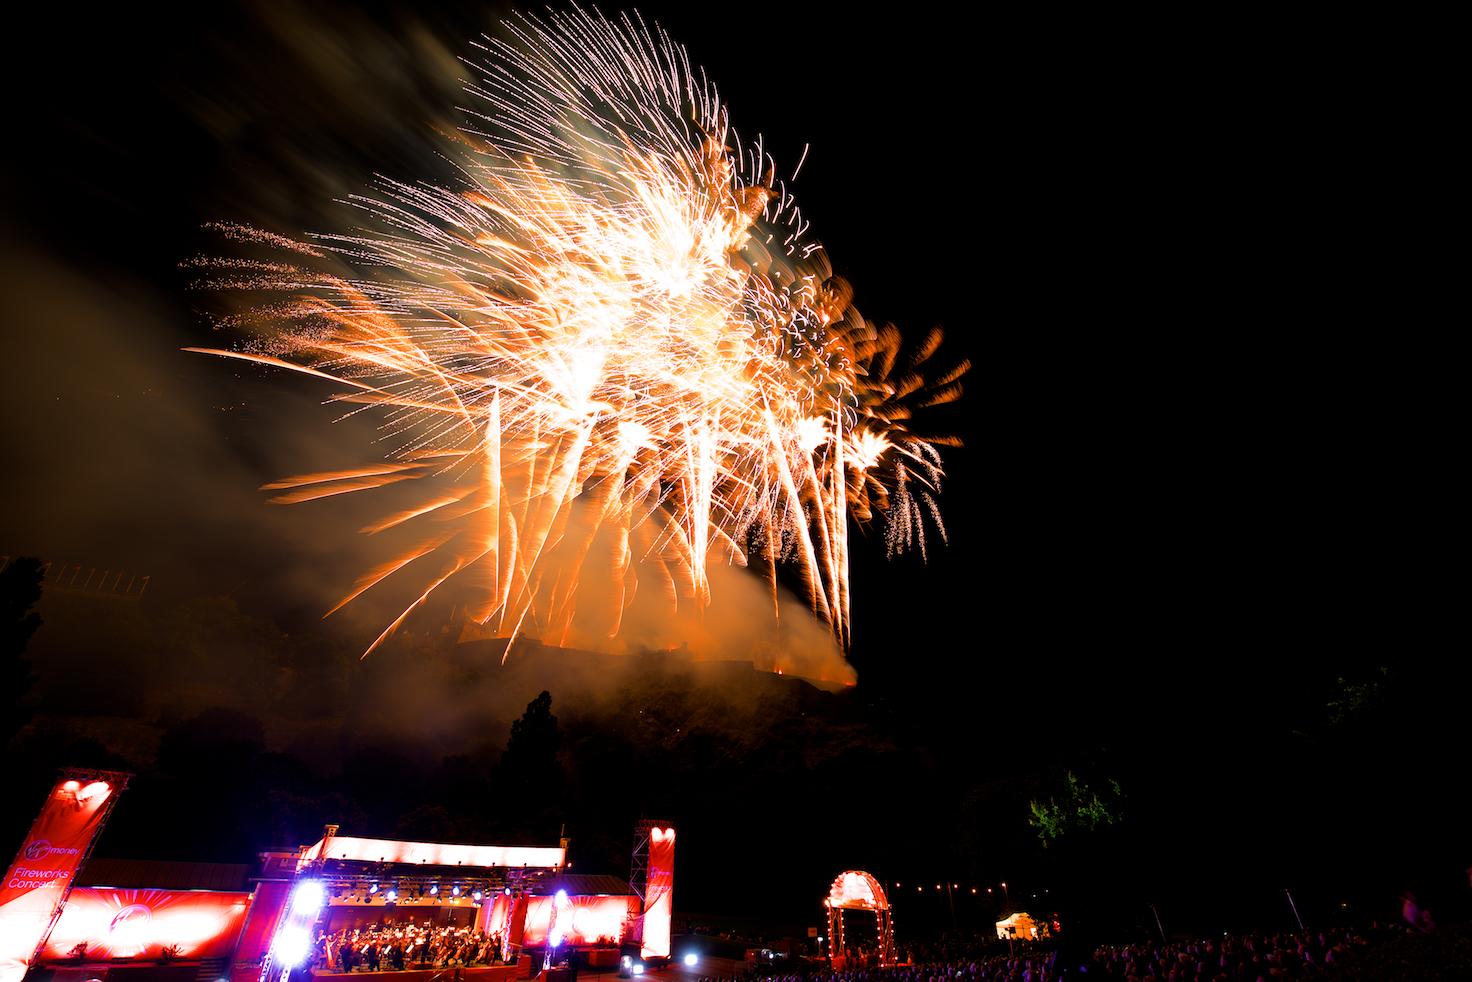 virgin-money-fireworks-concert-edinburgh-castleedinburgh-international-festival-edinburgh-castle-29th-august-2016-13